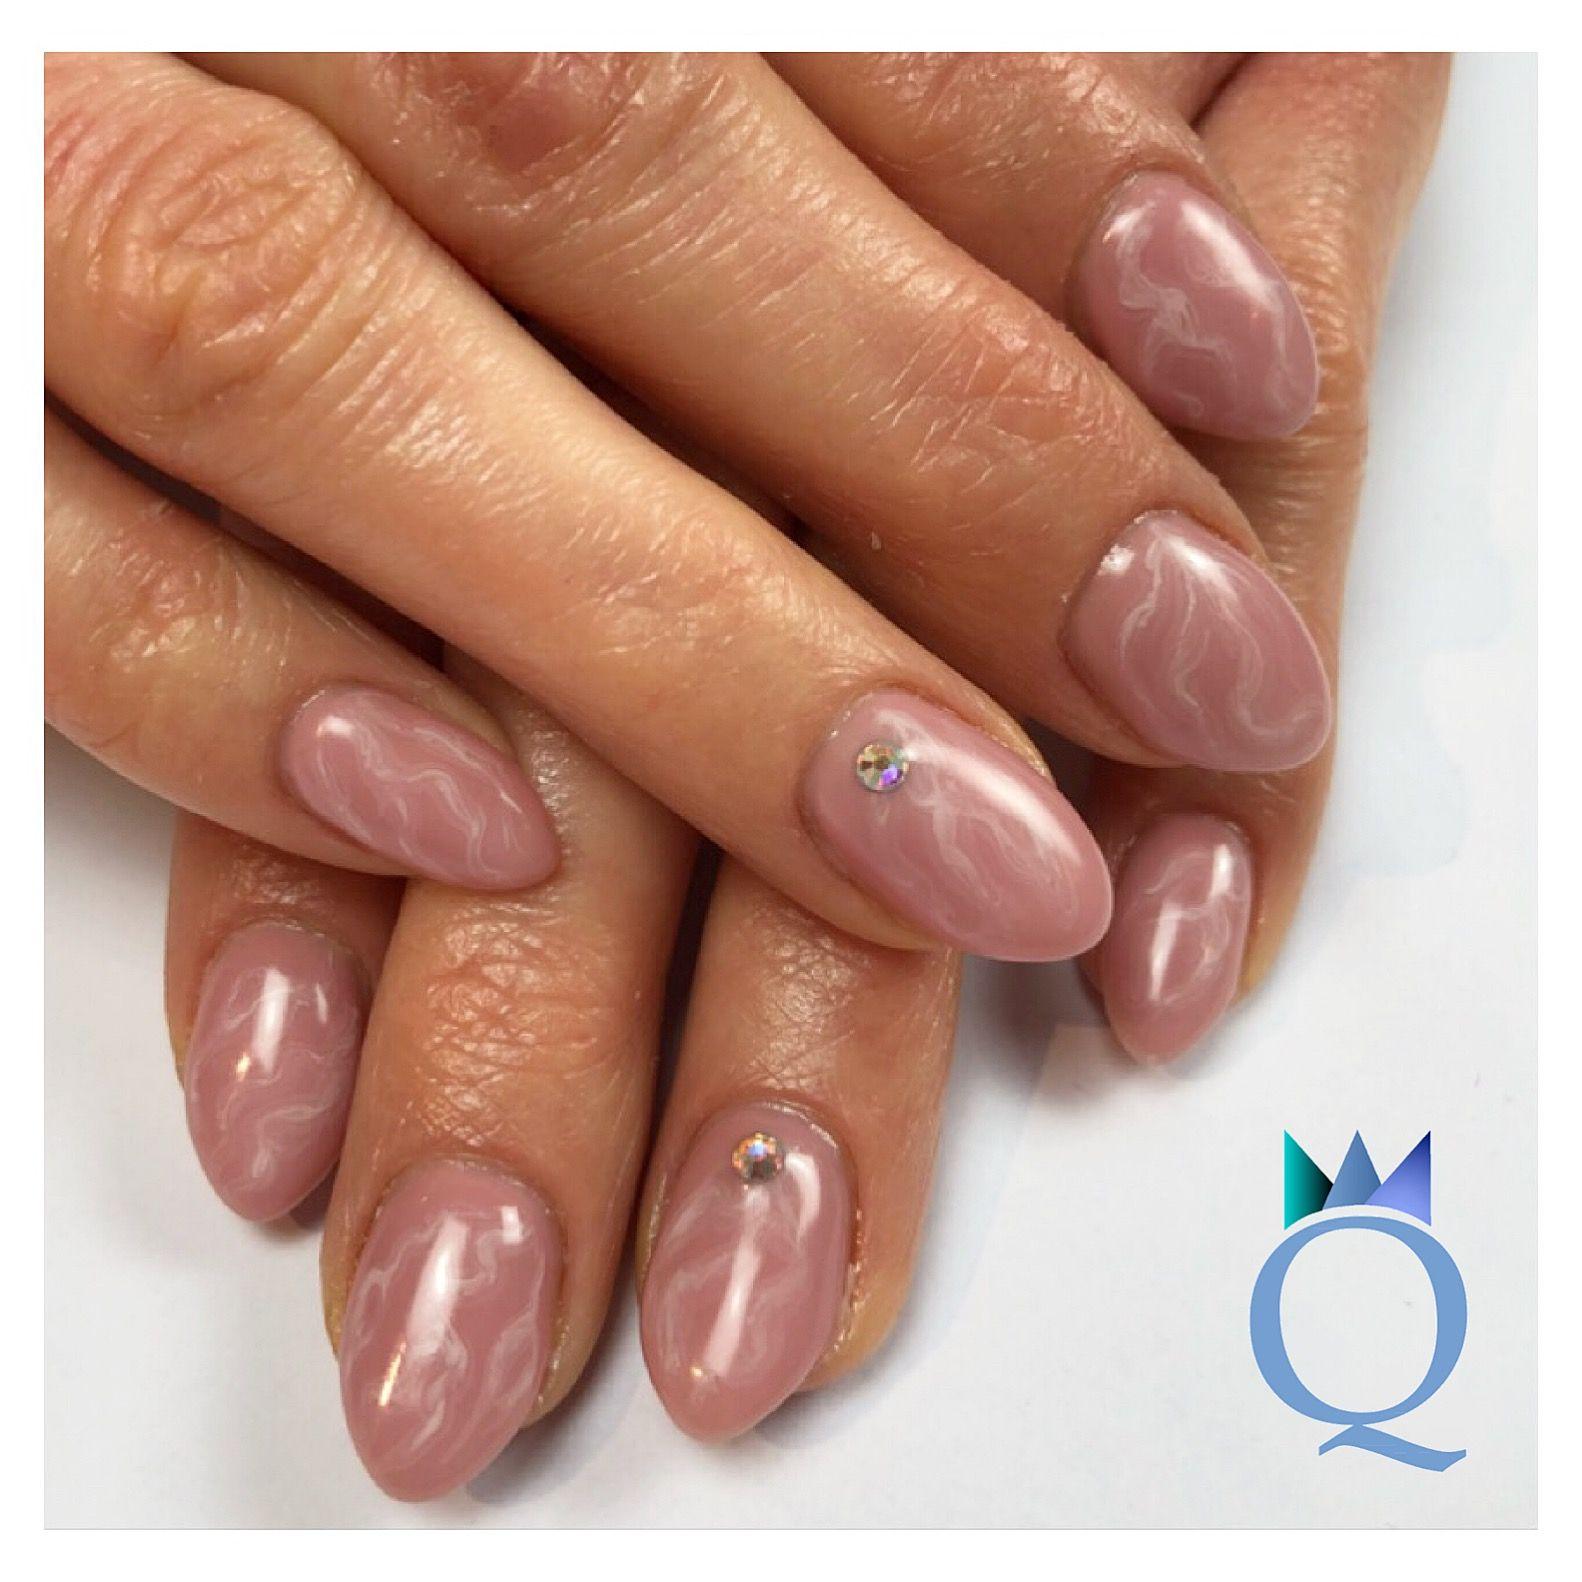 almondnails #gelnails #nails #marblenails #marble #yvesswiss ...